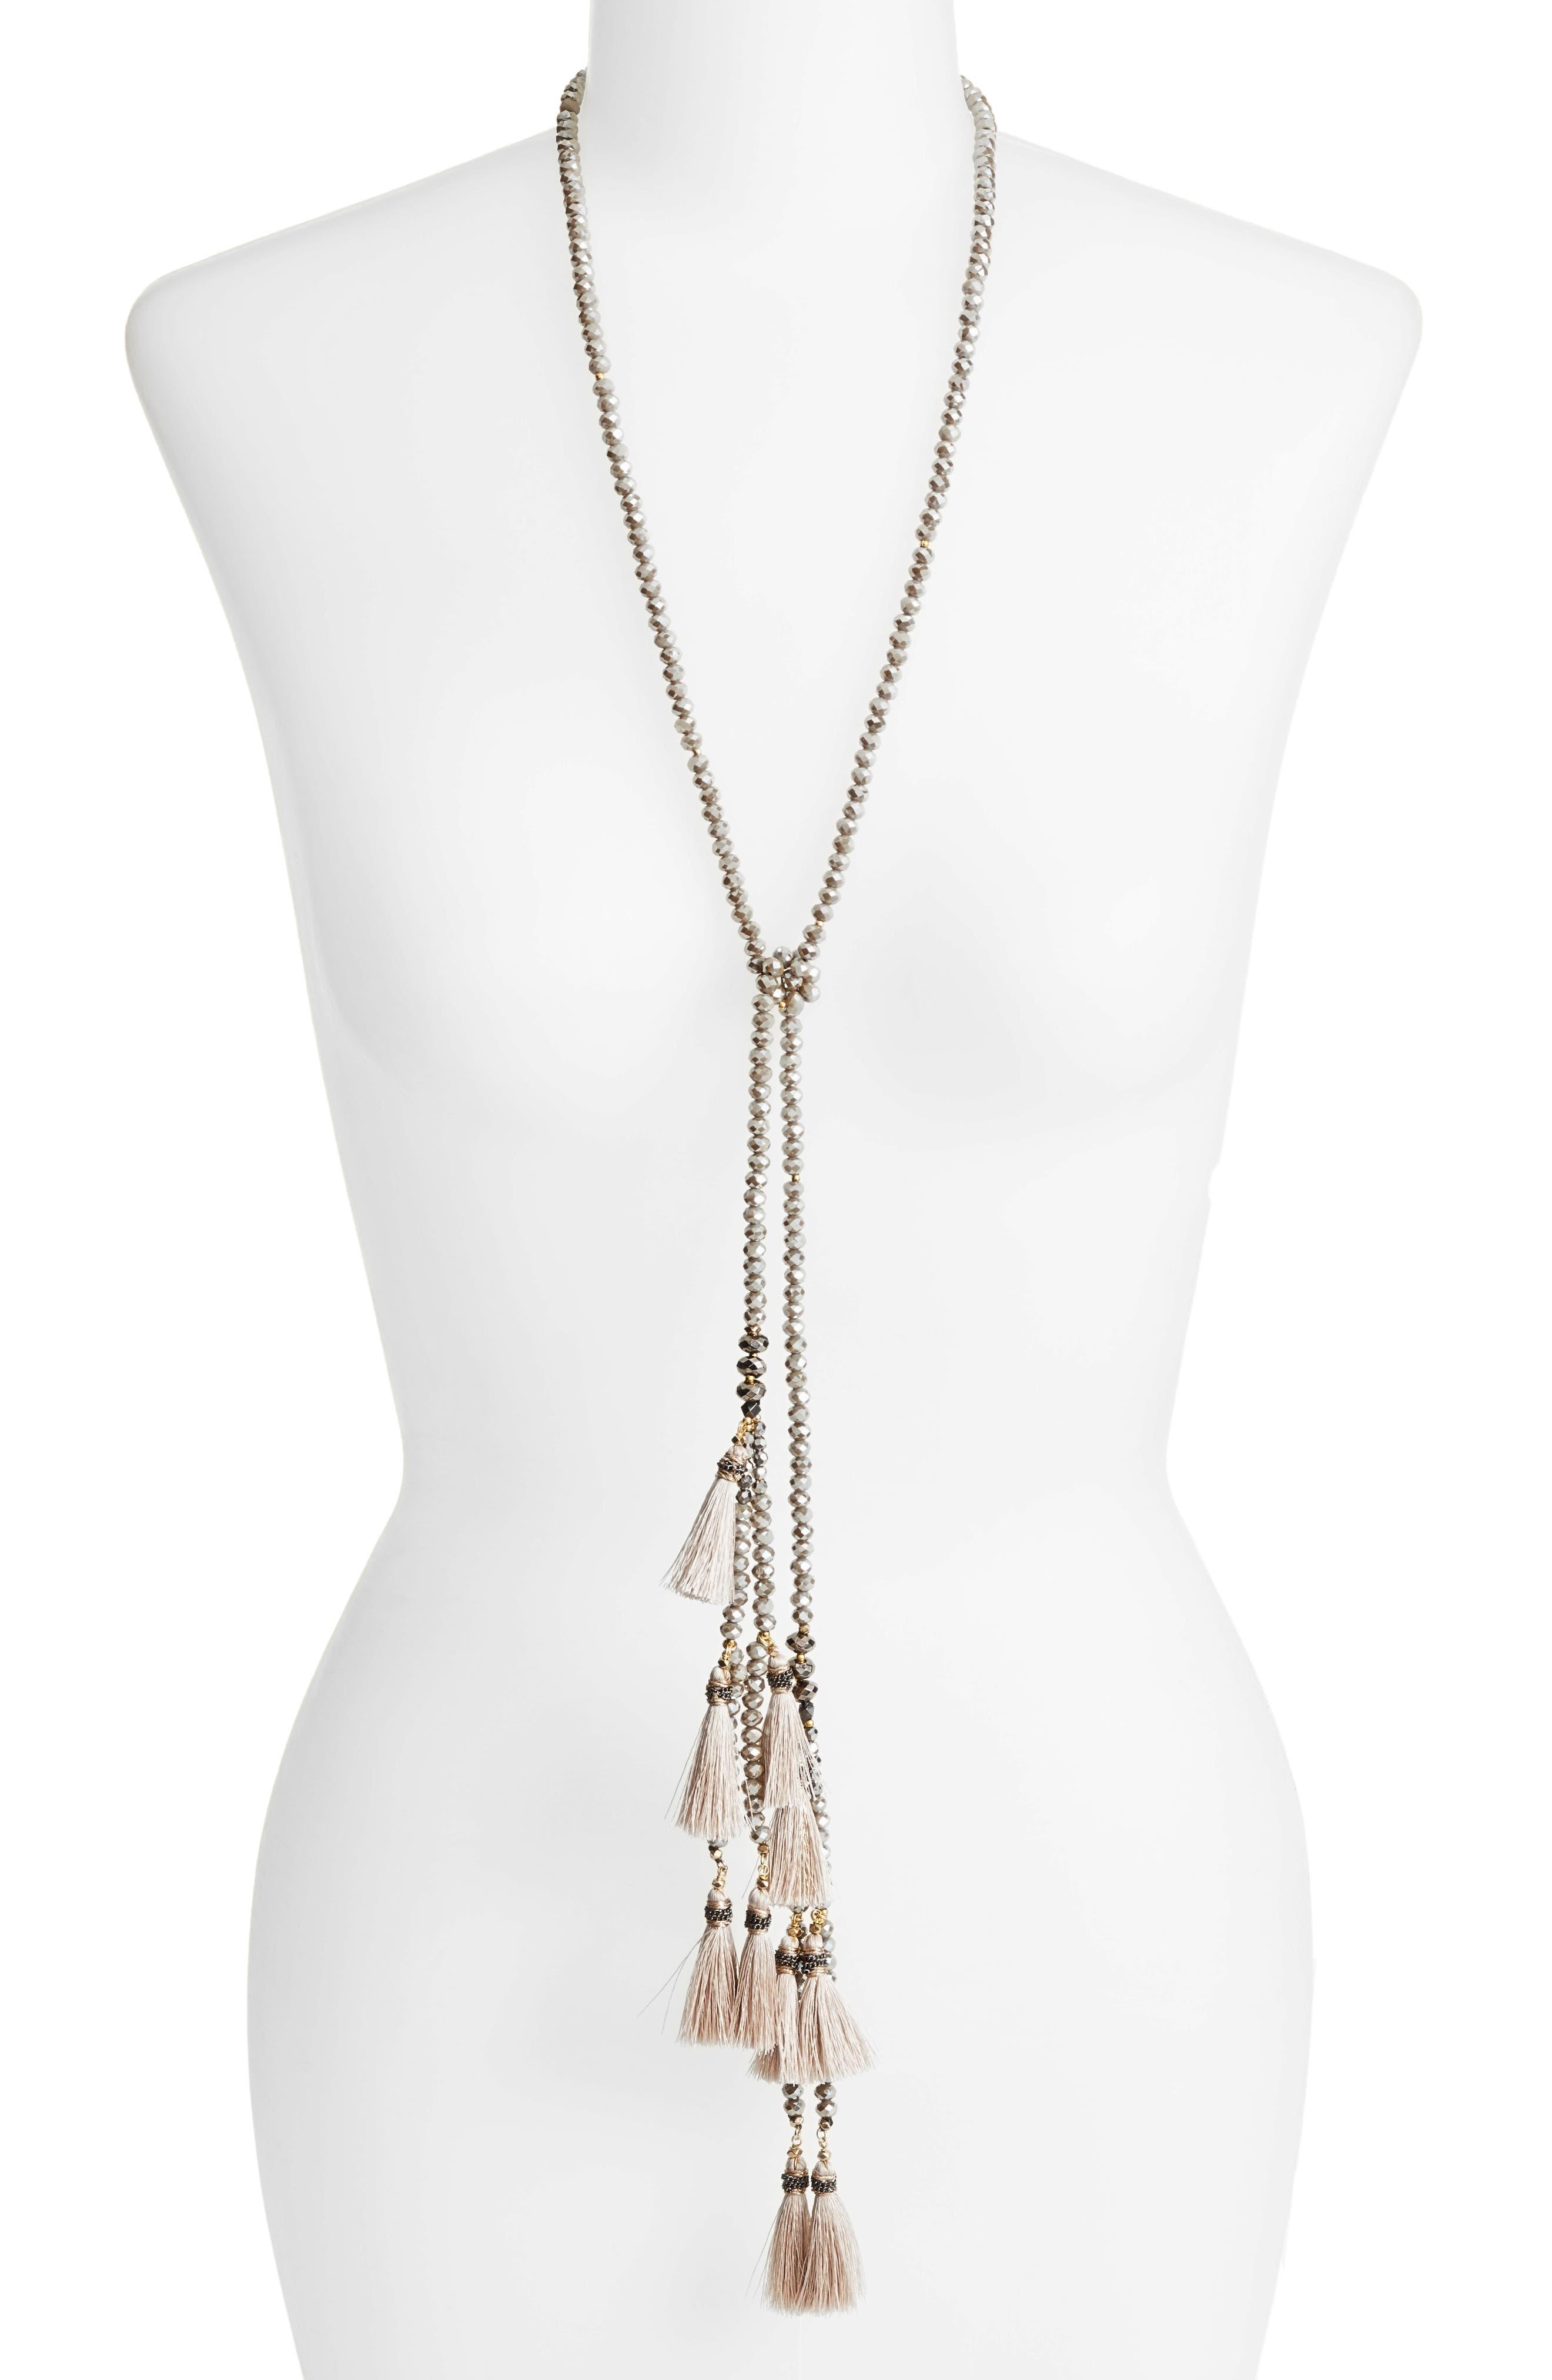 Main Image - Nakamol Design Tassel Lariat Necklace